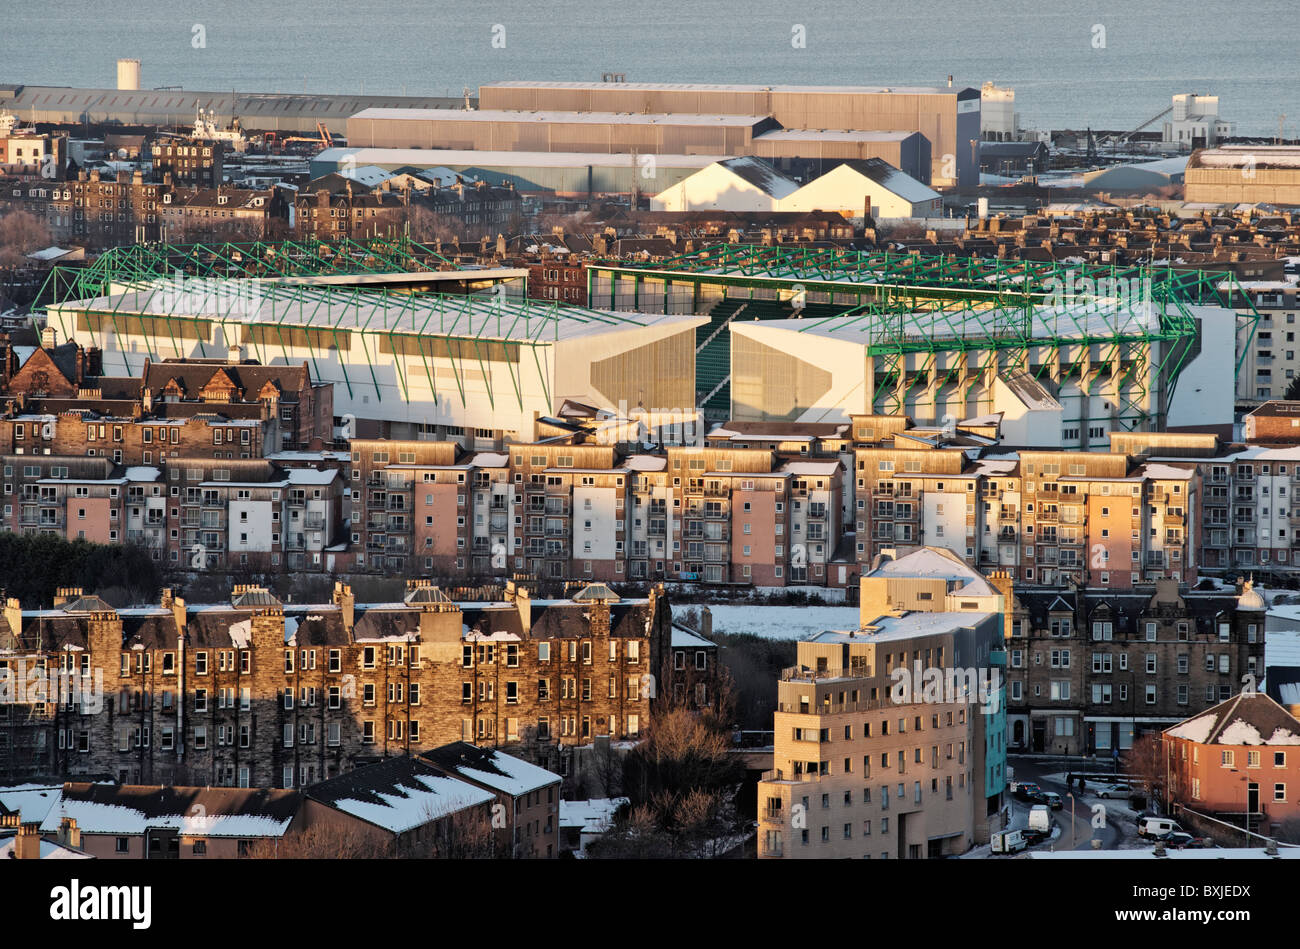 The Hibernian Football Club Easter Road football stadium, Edinburgh, Scotland, UK. Stock Photo